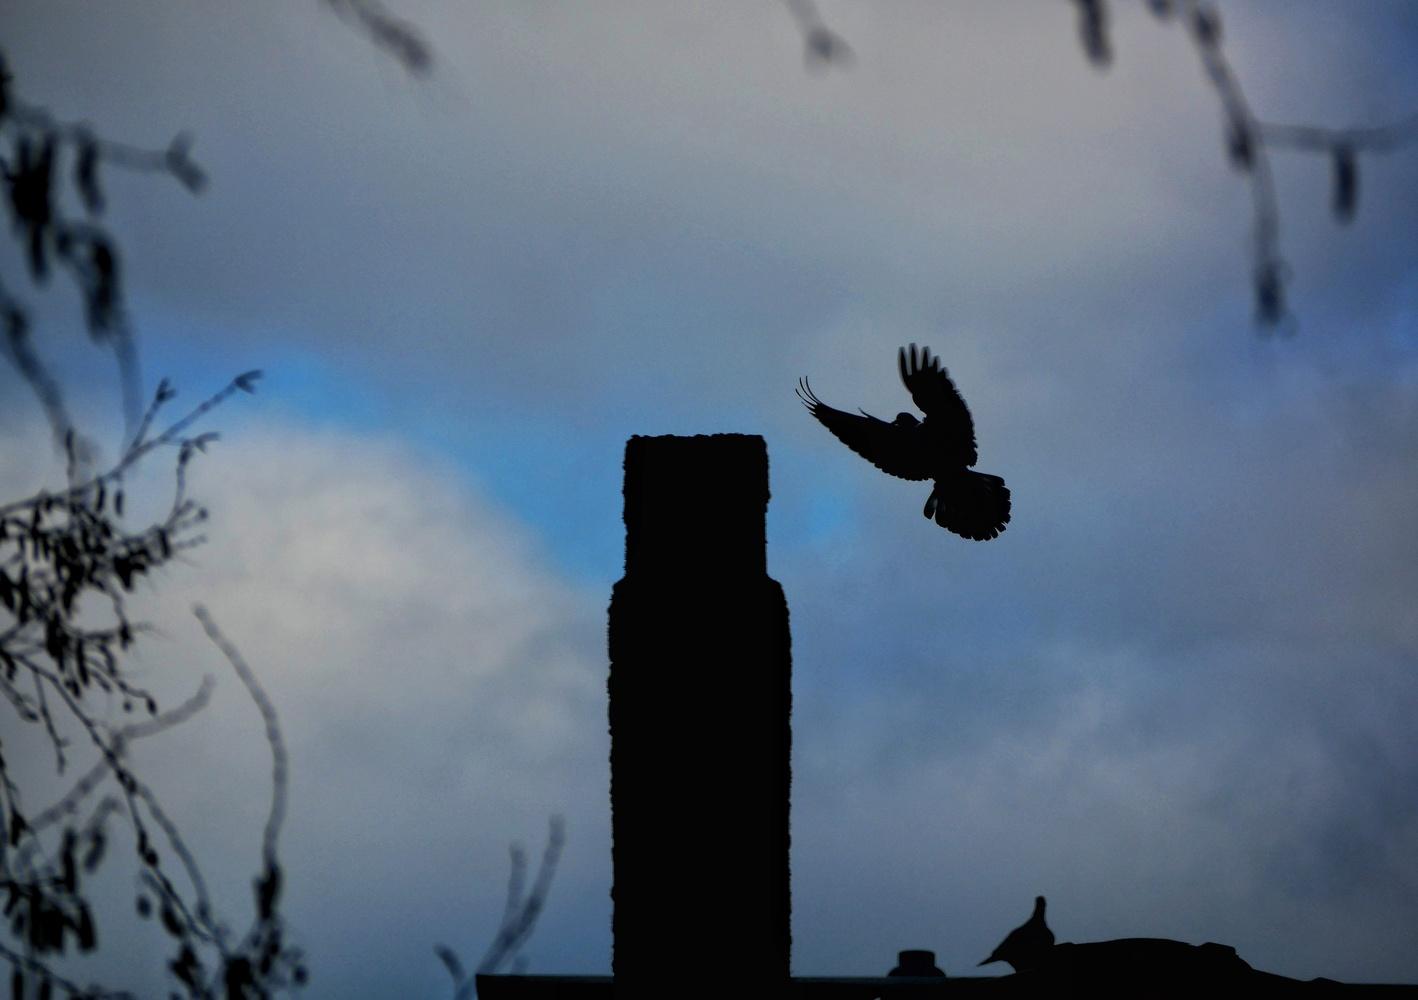 Dancing dove by Jack Sprog